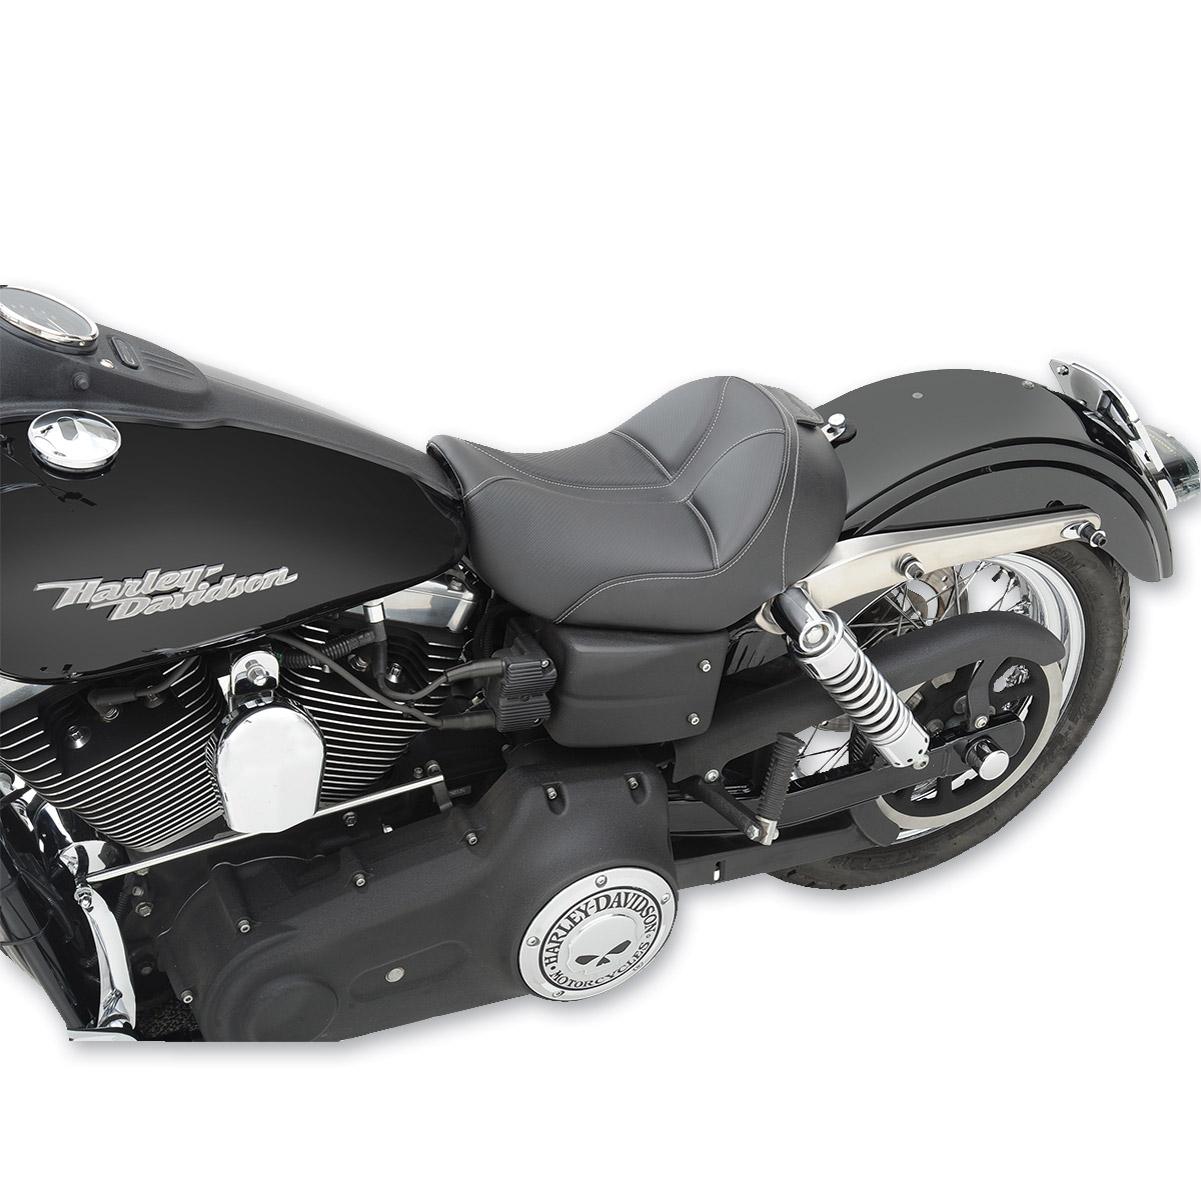 Saddlemen Dominator Solo Seat 806 04 0042 Jpcycles Com